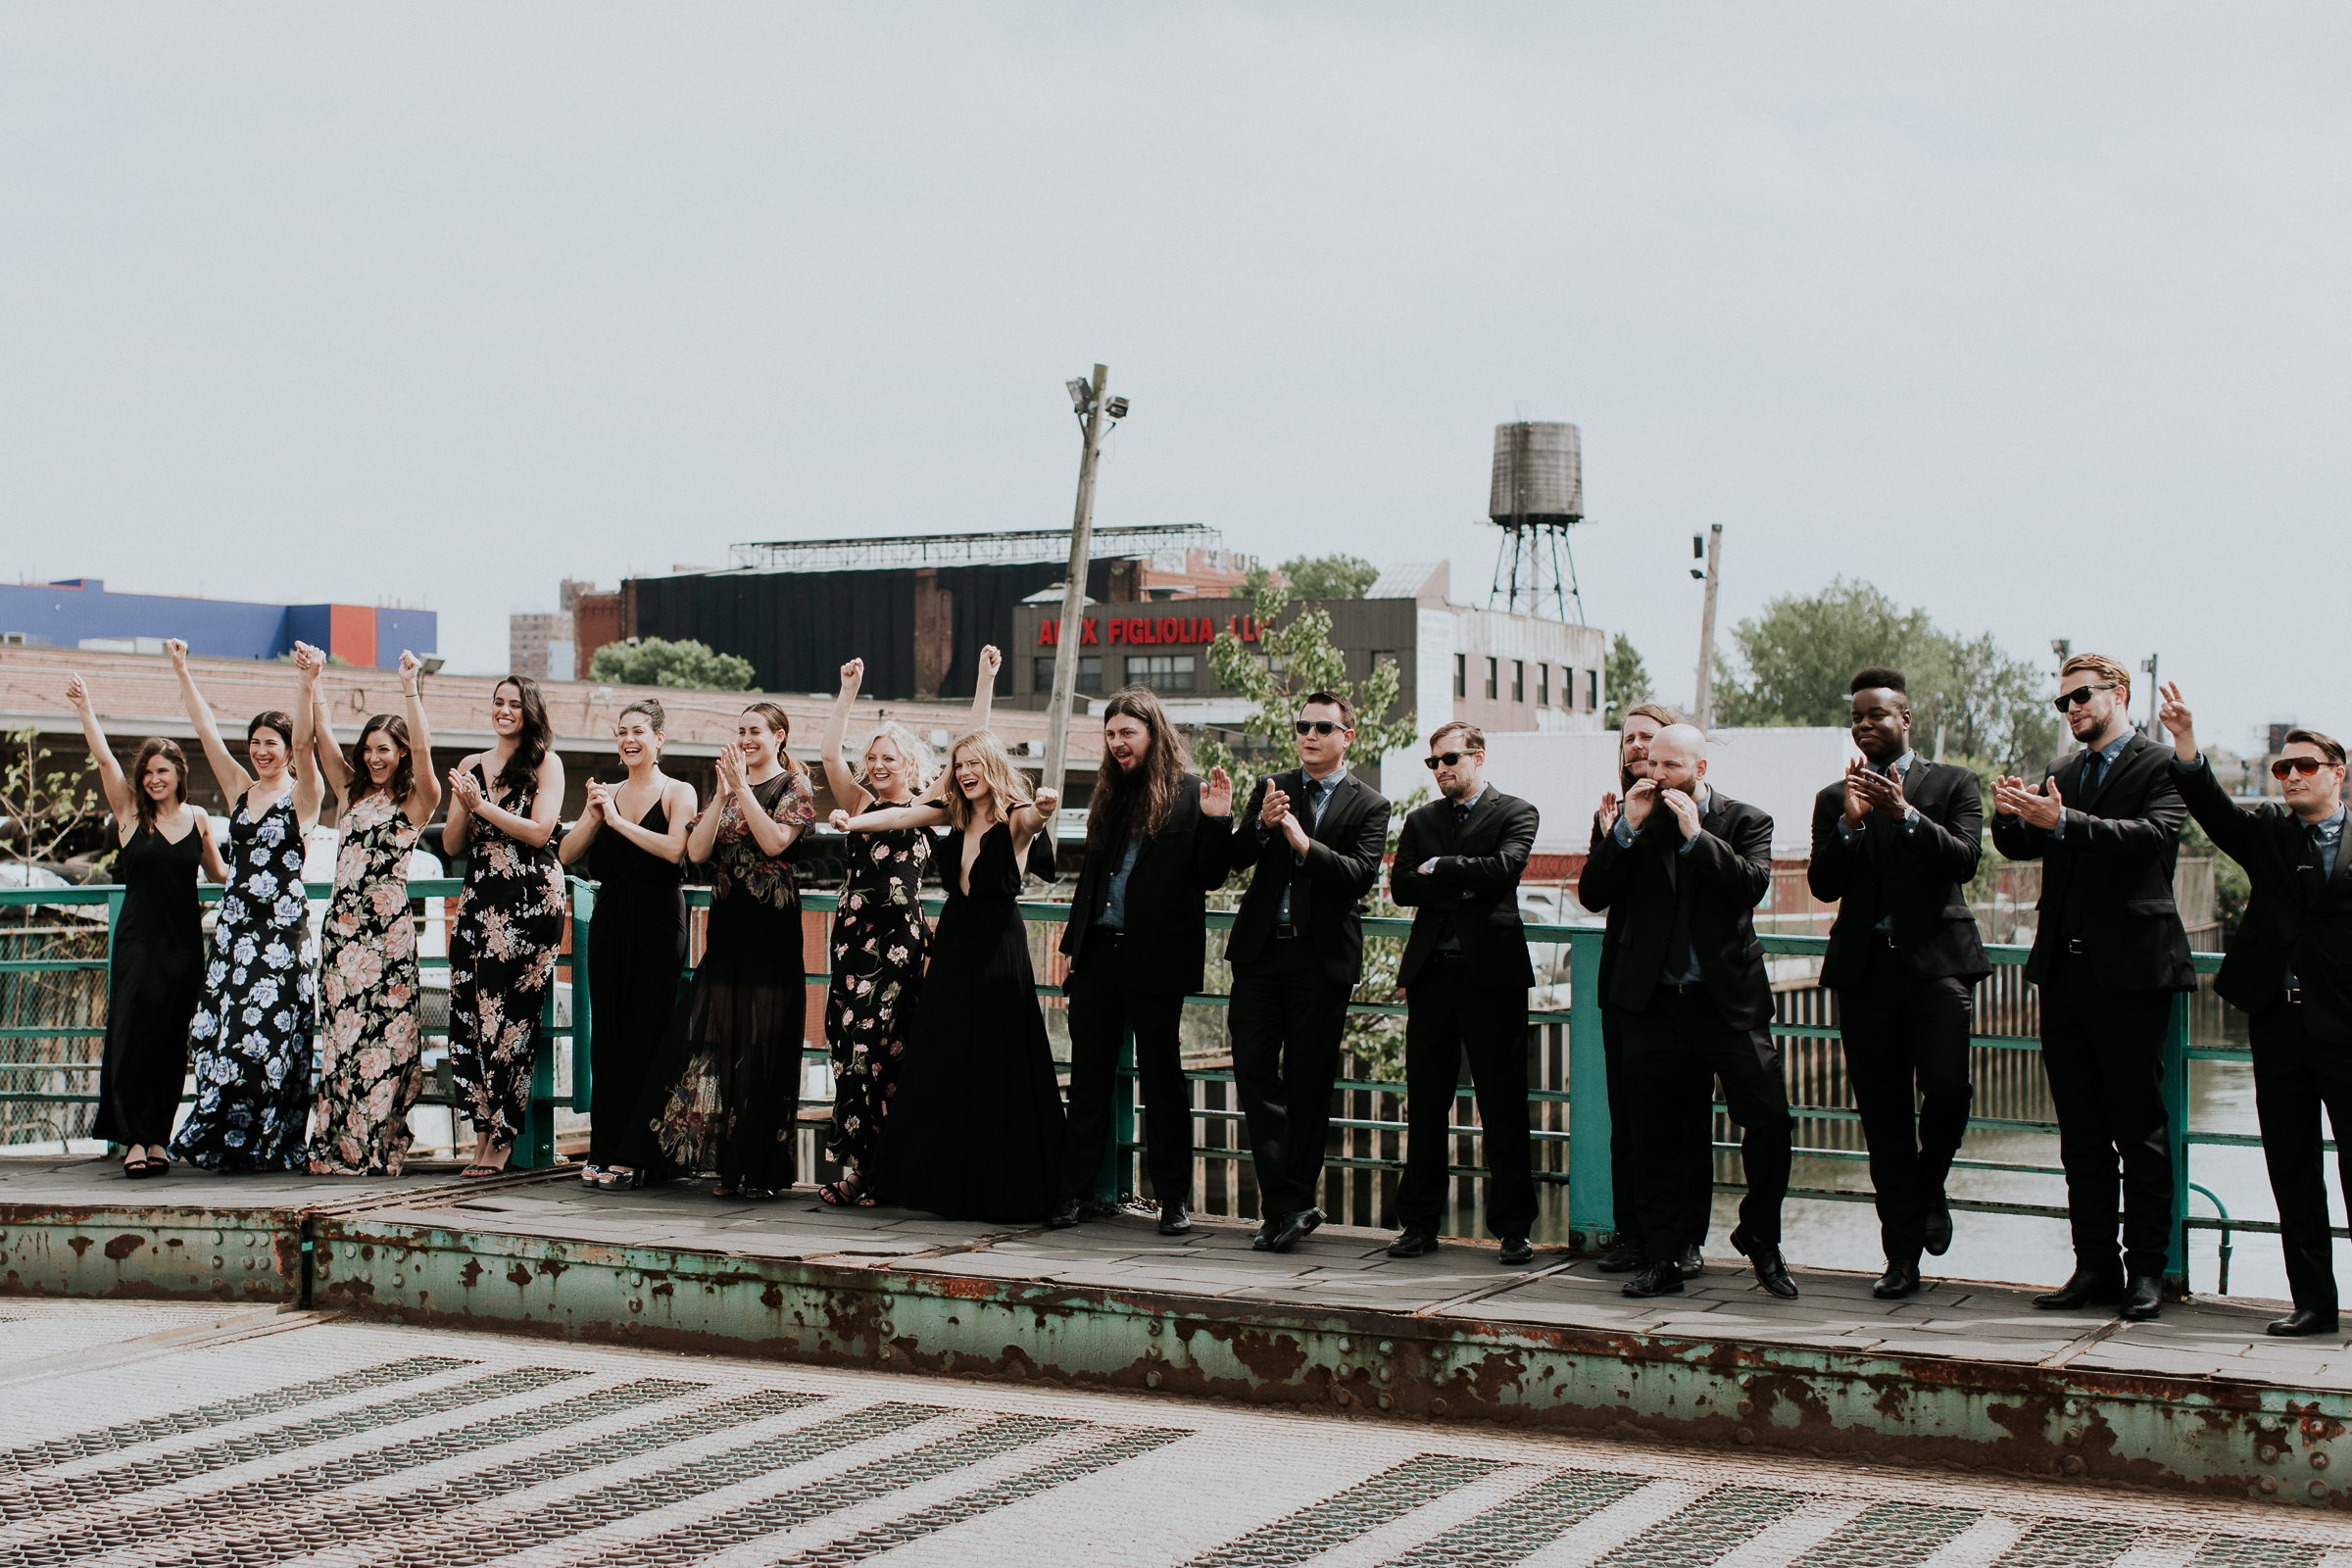 501-Union-Brooklyn-Fine-Art-Documentary-Wedding-Photographer-30.jpg